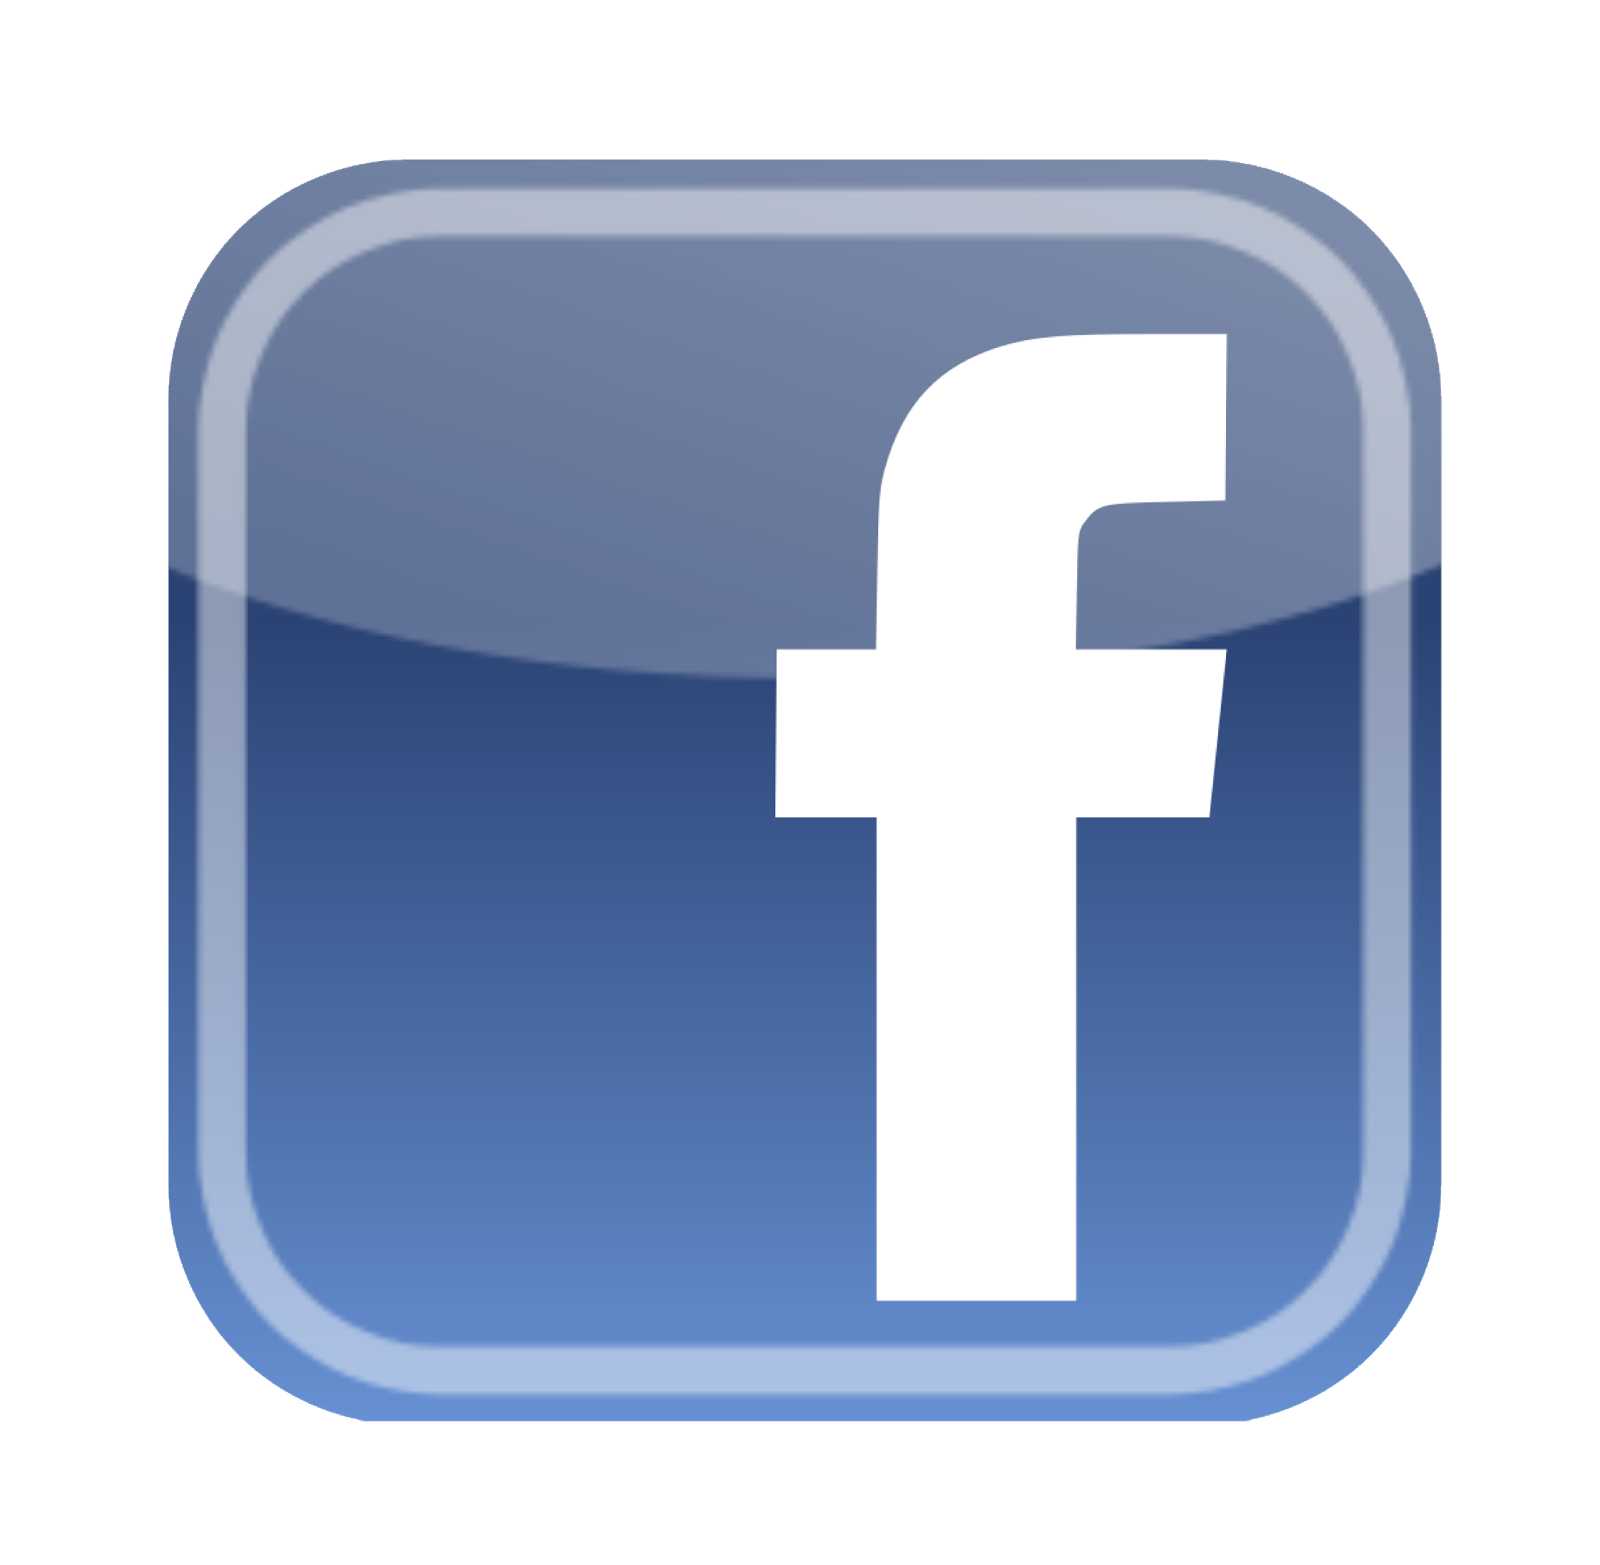 Zapraszam też na moją stronę na Facebooku :)